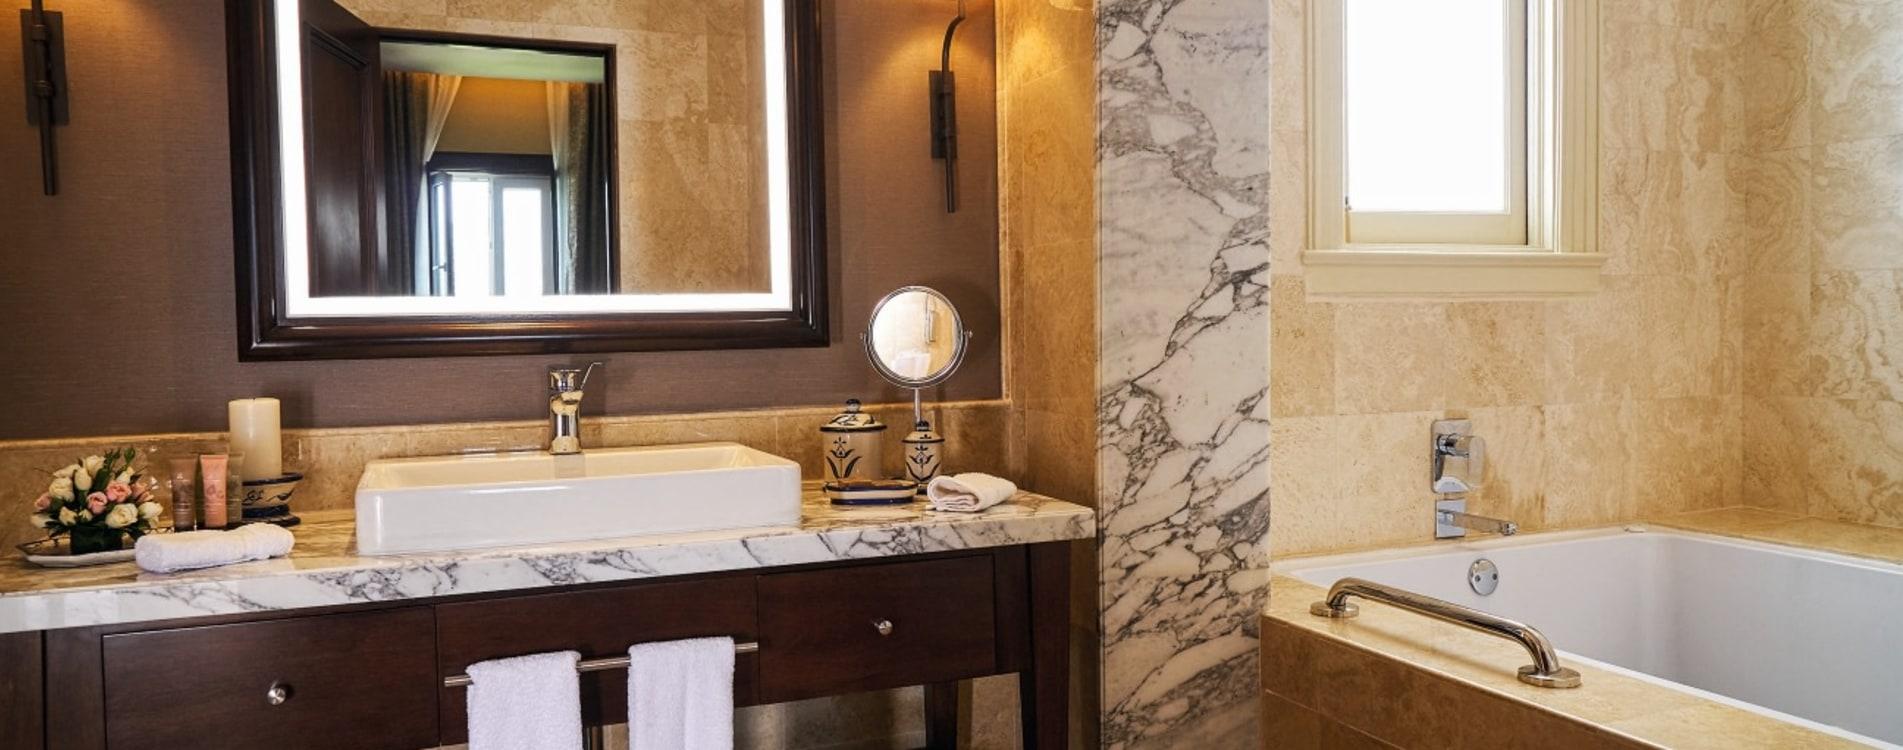 Country Club Lima Hotel - Peru  Take Memories Travel Design